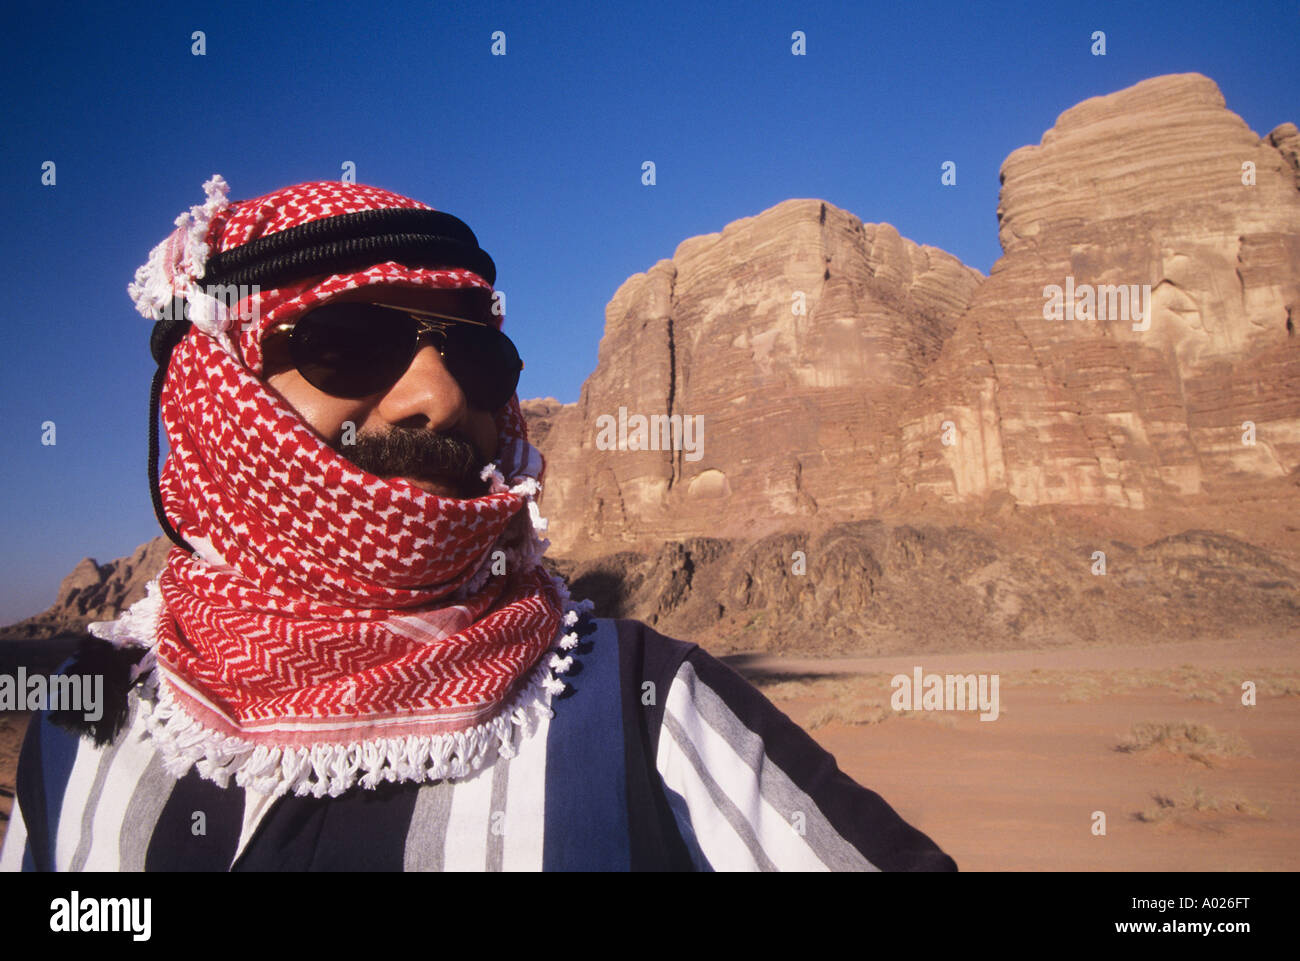 Arab Man in turban, Wearing Sunglasses, standing in desert landscape - Stock Image